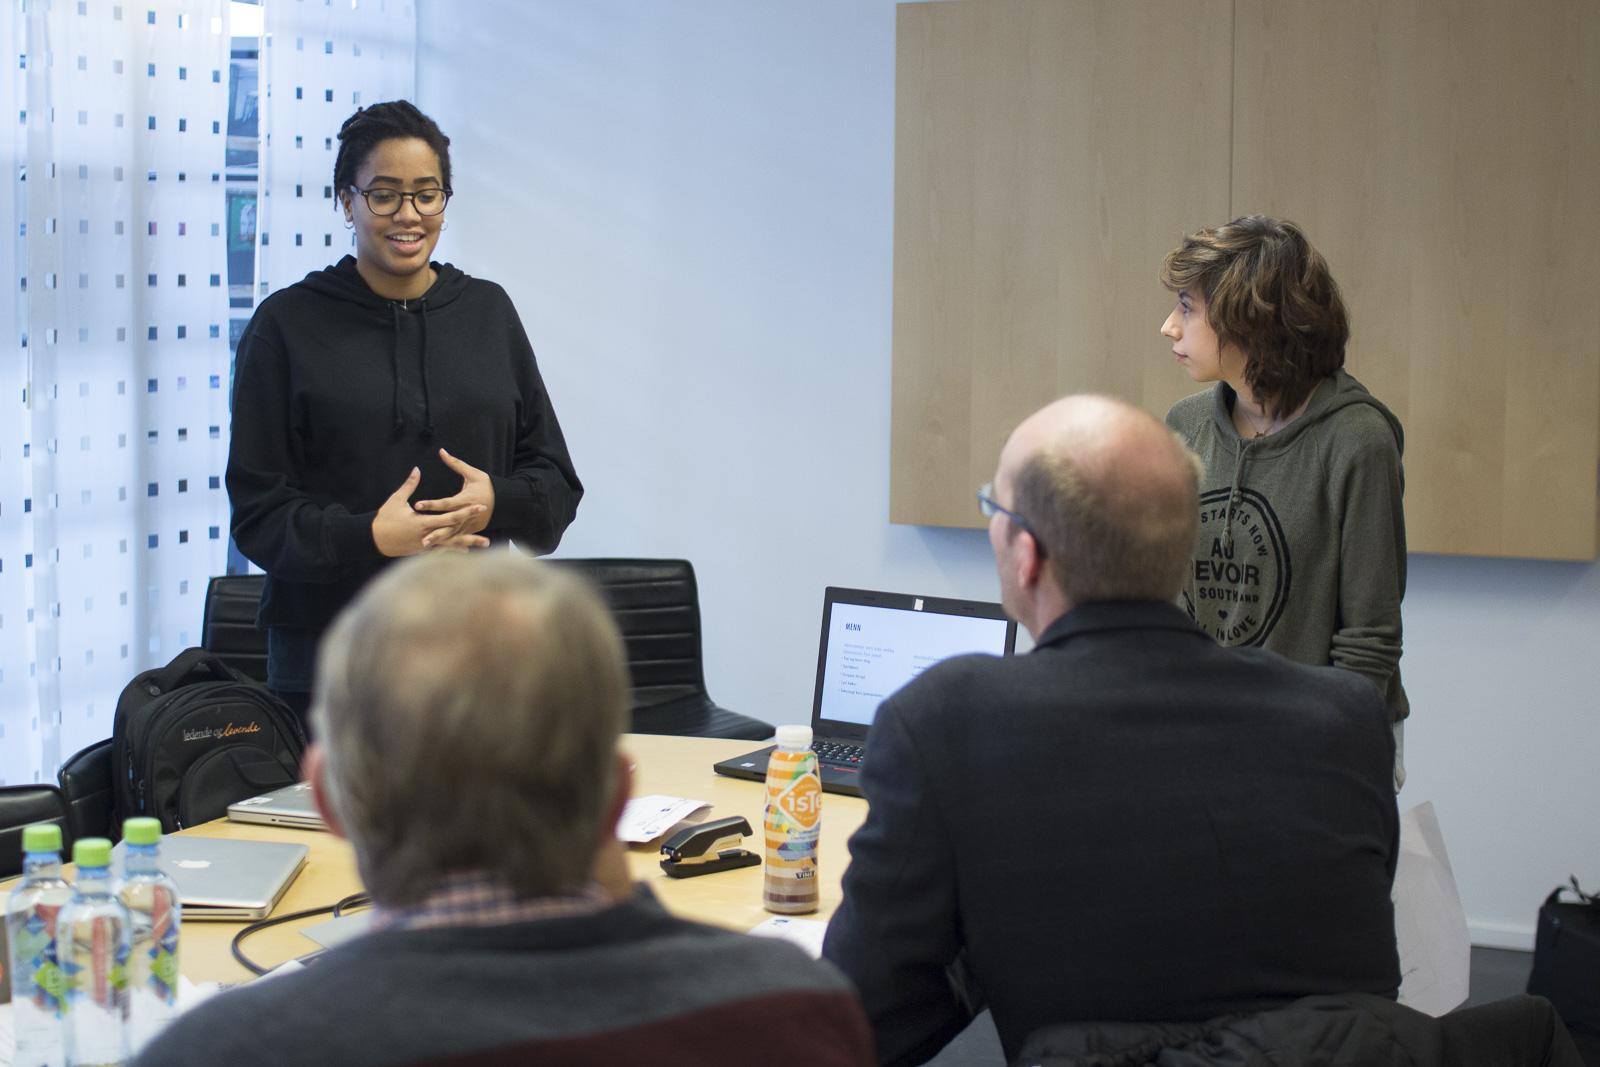 Gründercamp i regi av Ungt Entrepenørskap på MK-Sørumsand